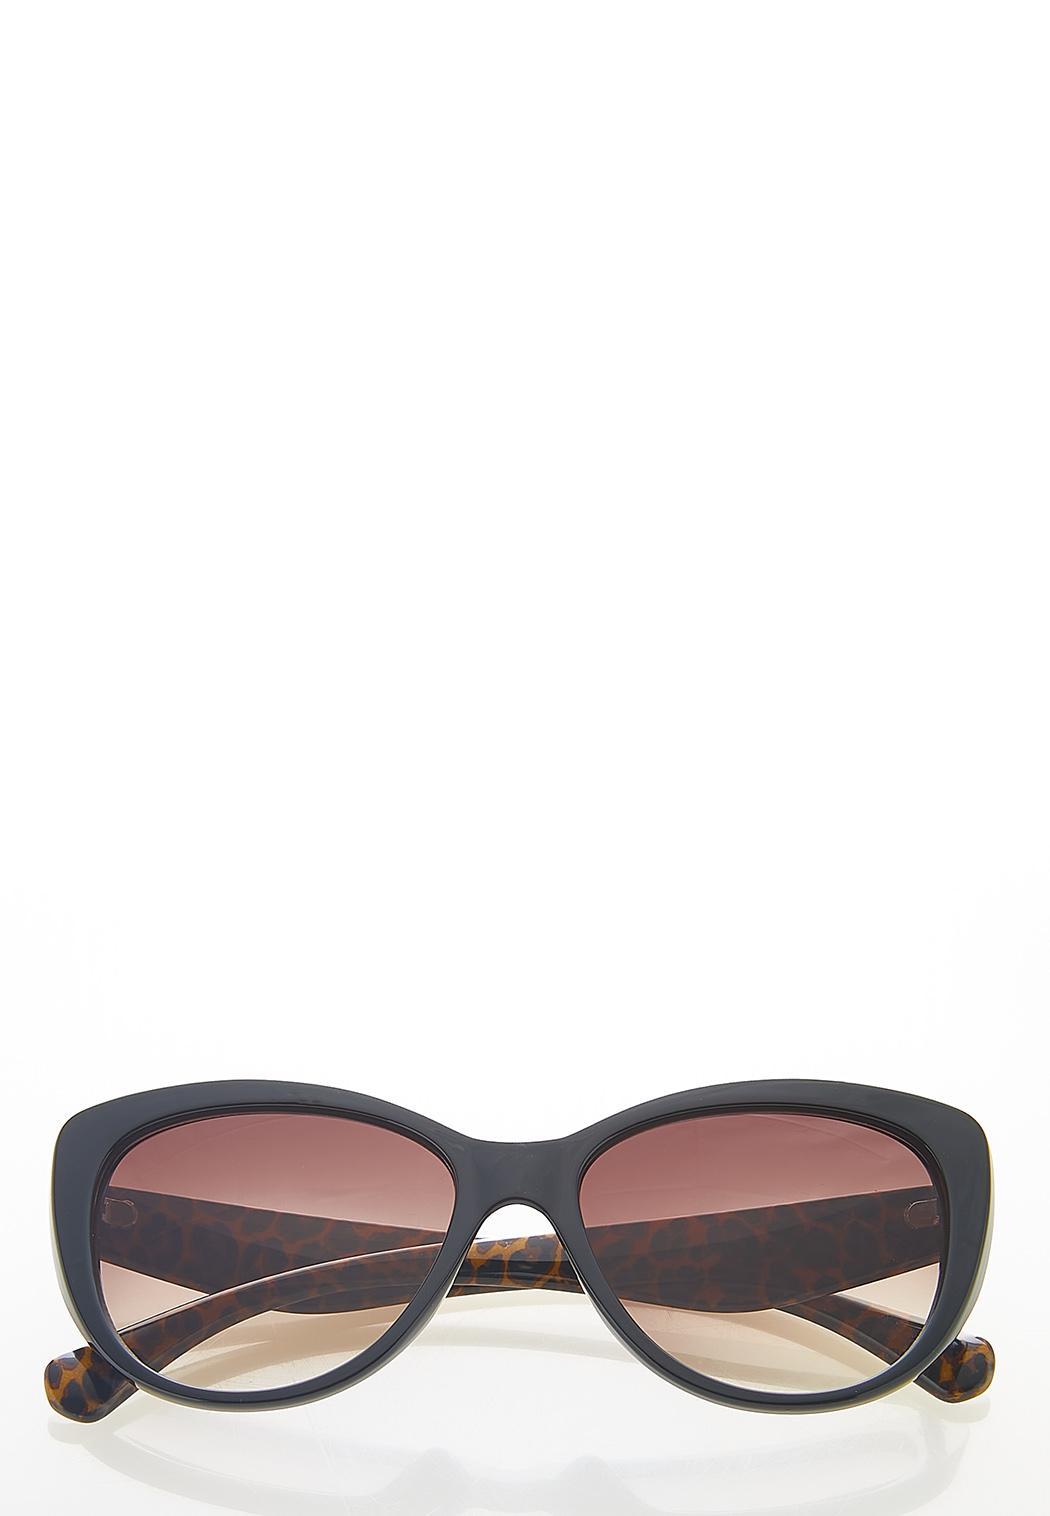 Leopard Arms Cat Eye Sunglasses